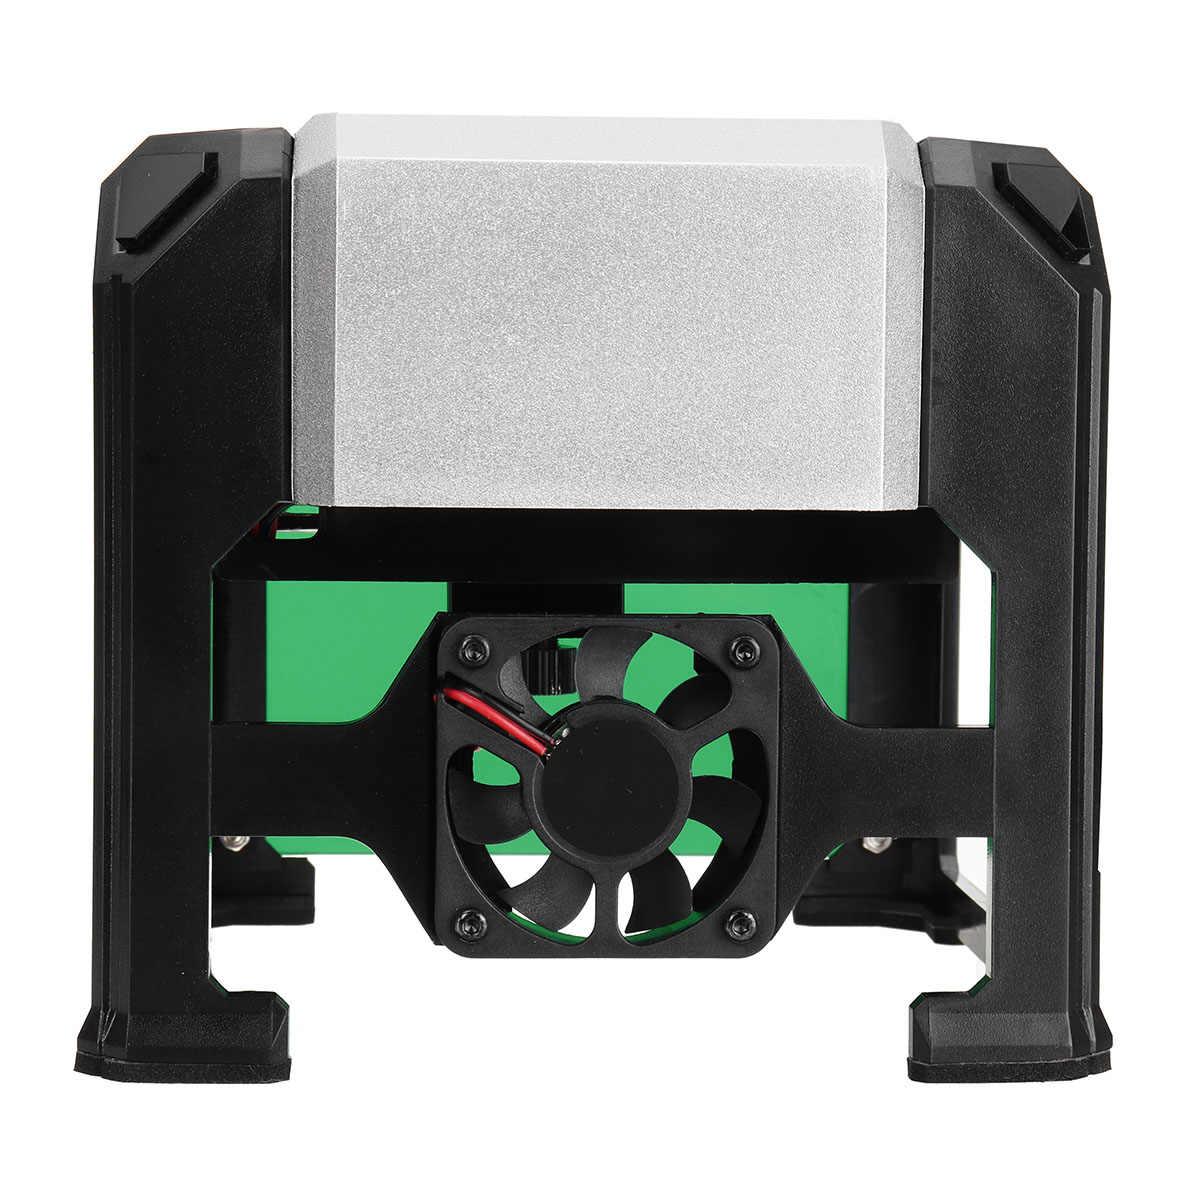 3000 MW Kecepatan Tinggi Laser Engraving Mesin USB DIY Grafir Laser Printer Otomatis Kerajinan Kayu Alat untuk Menang/Mac sistem OS